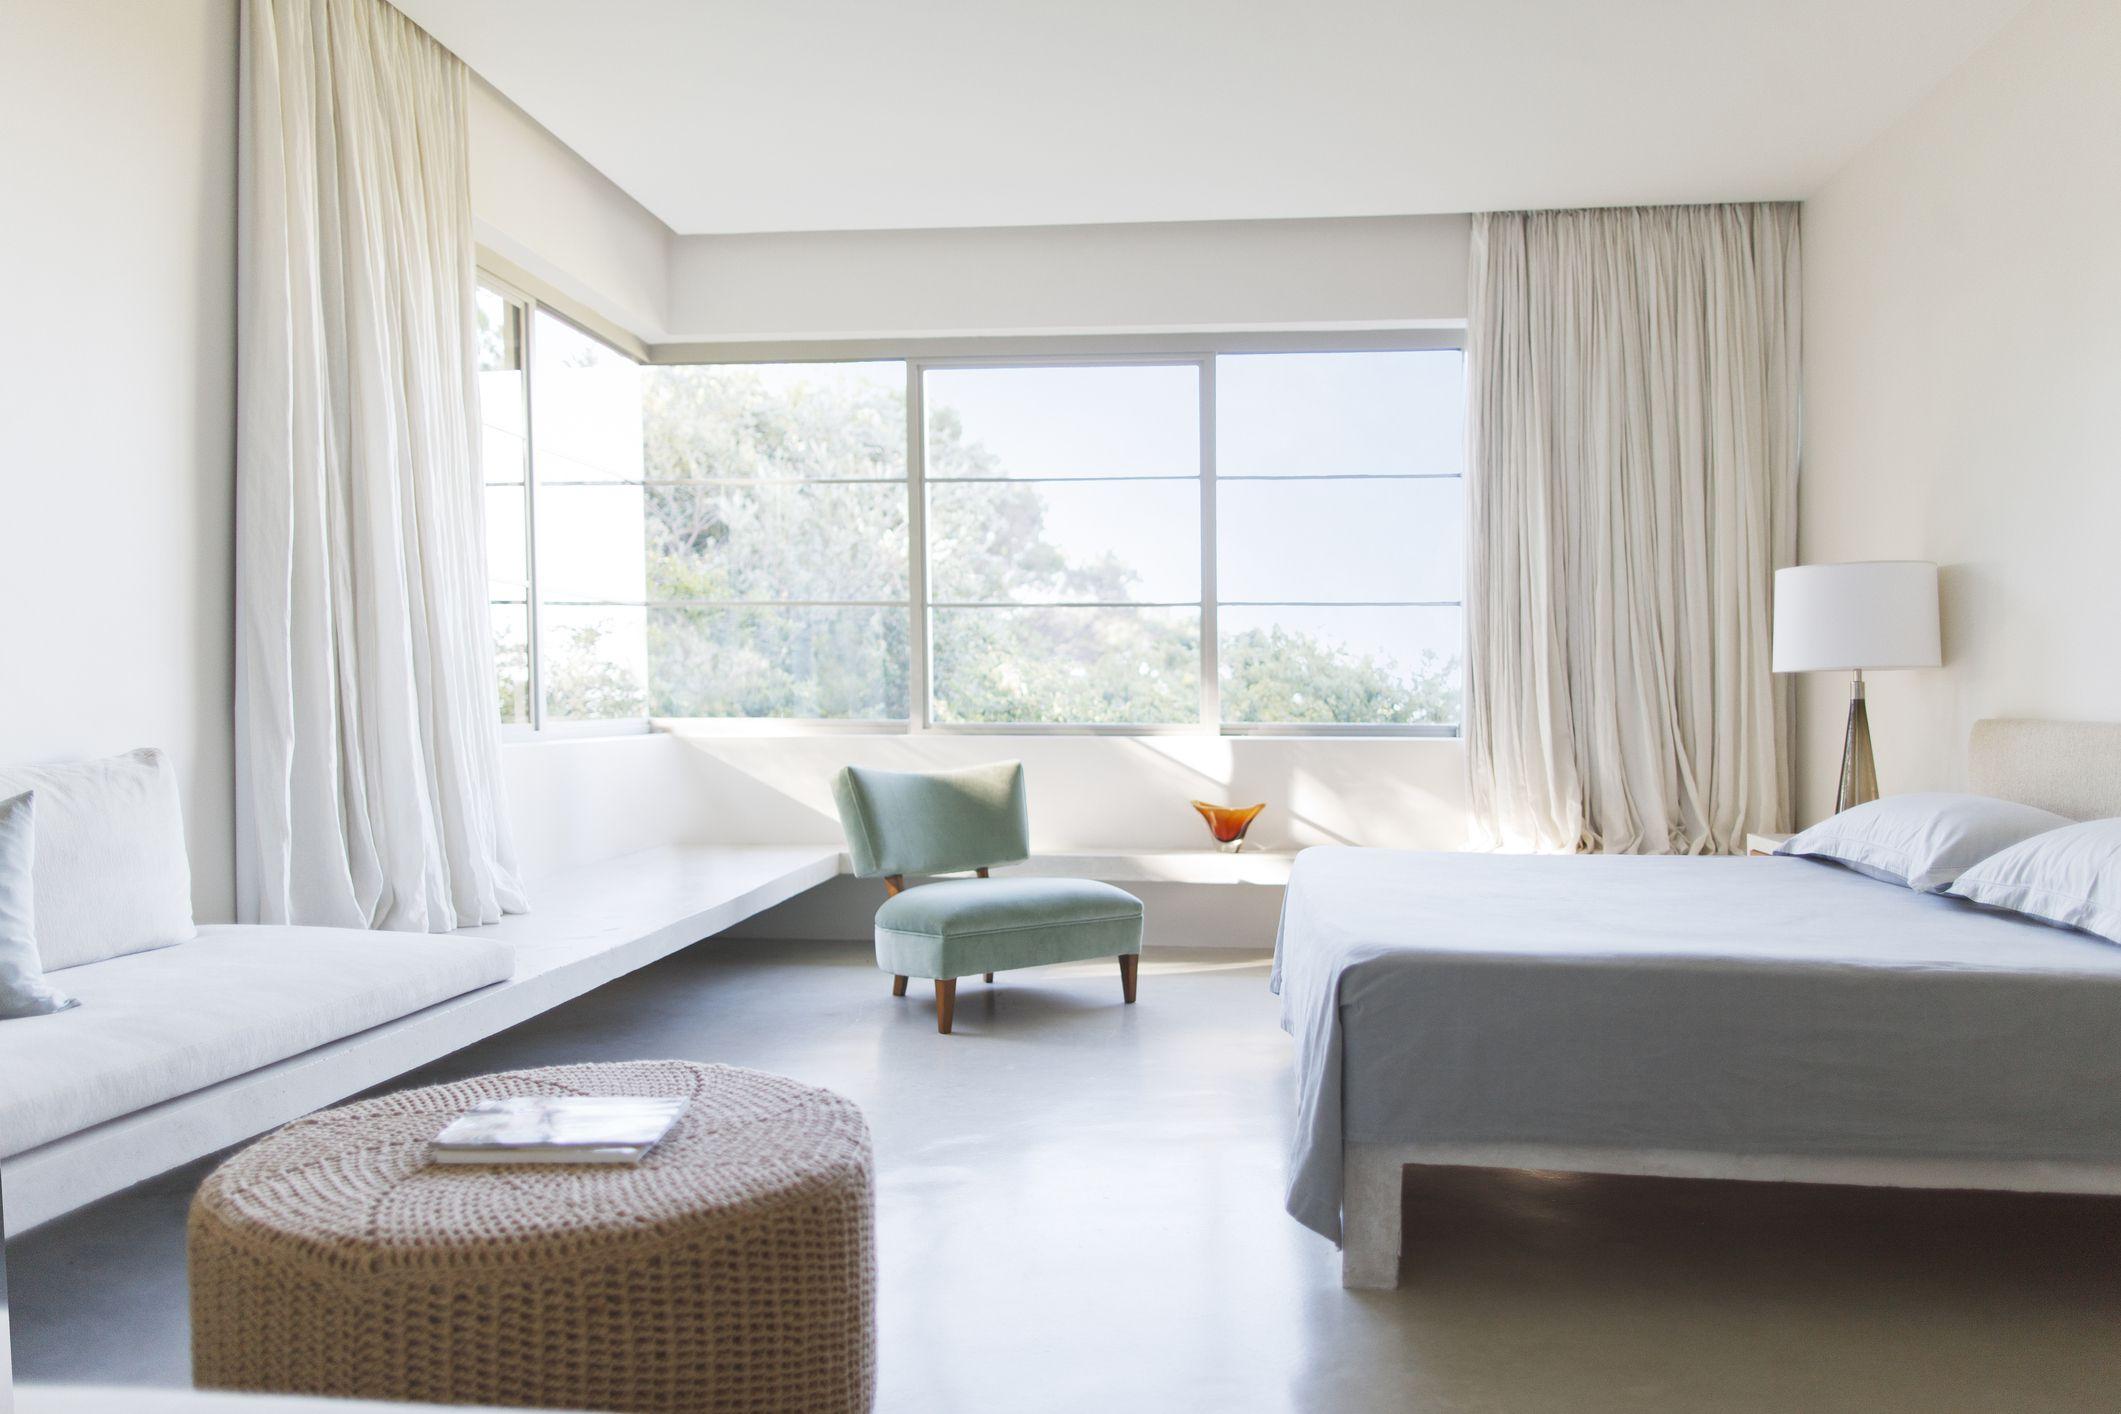 Linoleum Bedroom Flooring Ideas